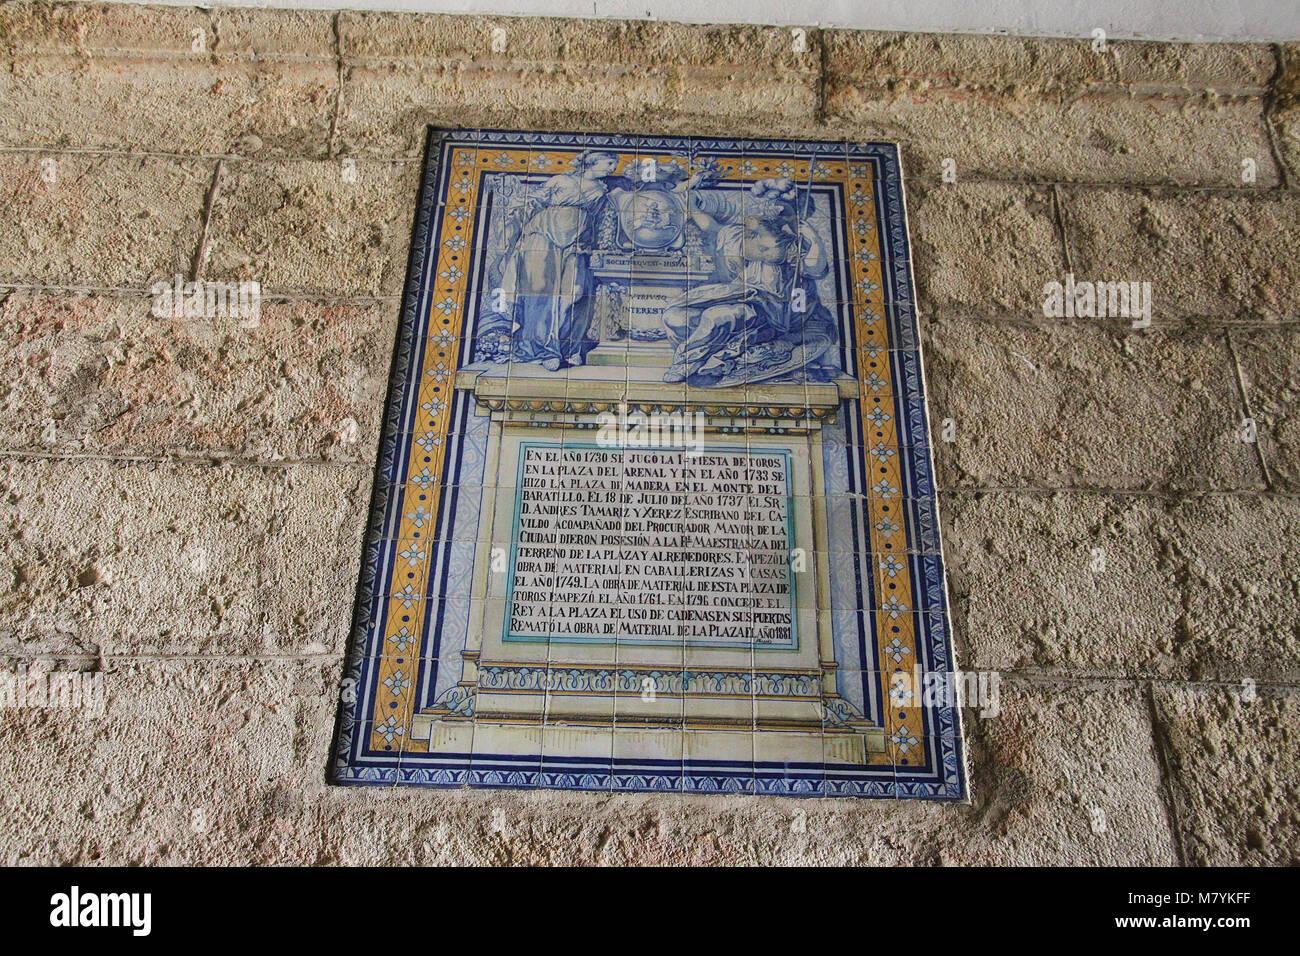 Tilework at Seville Bullring - Stock Image